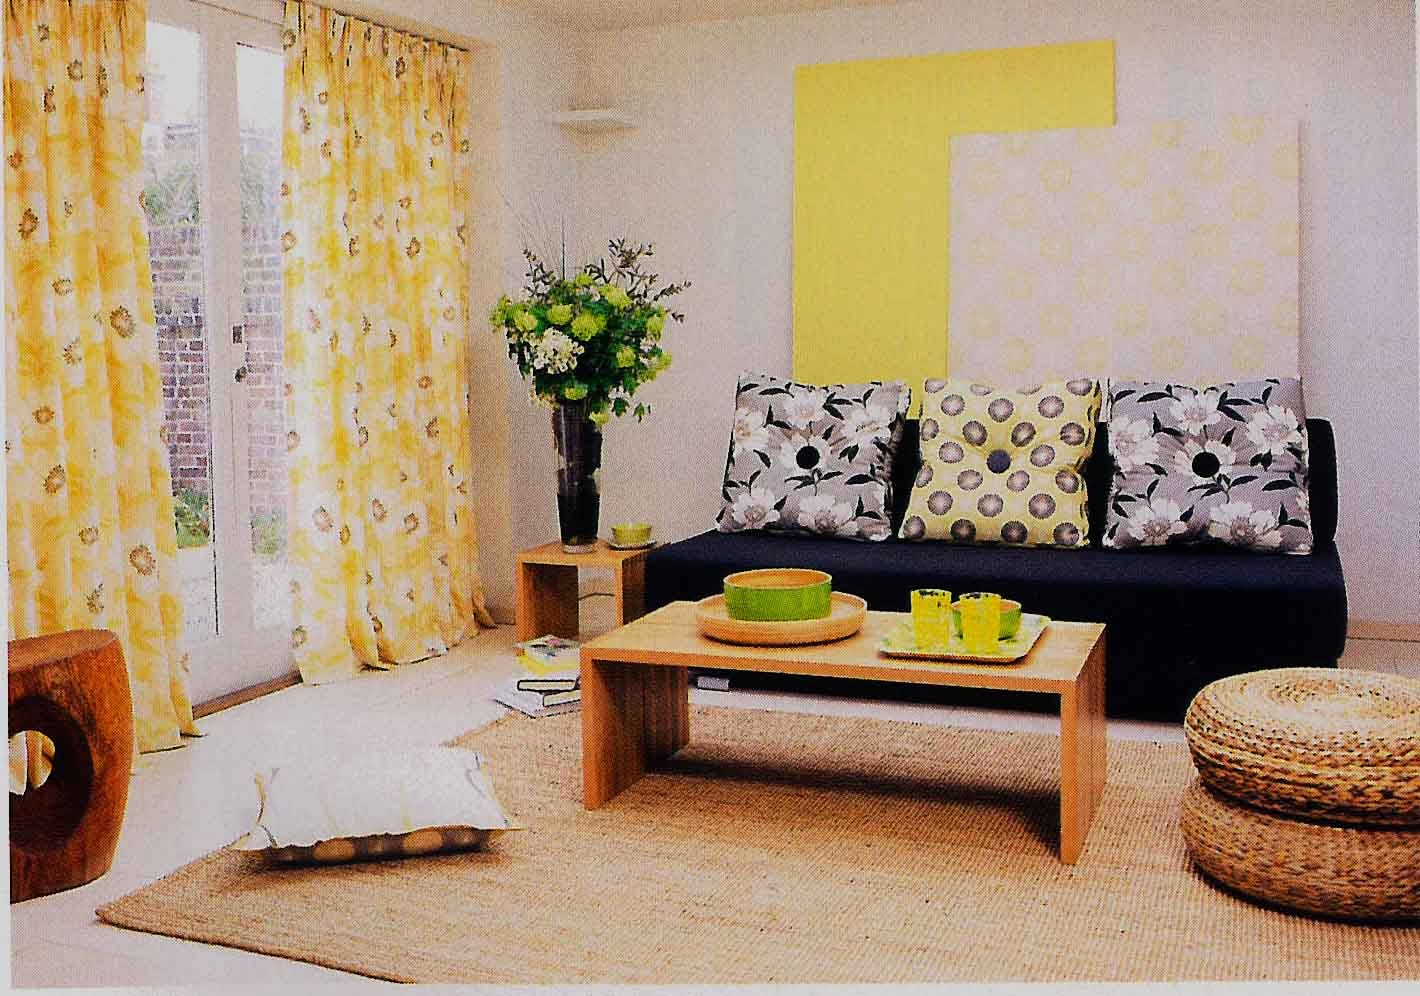 gambar hiasan ruang tamu rumah kampung dream home